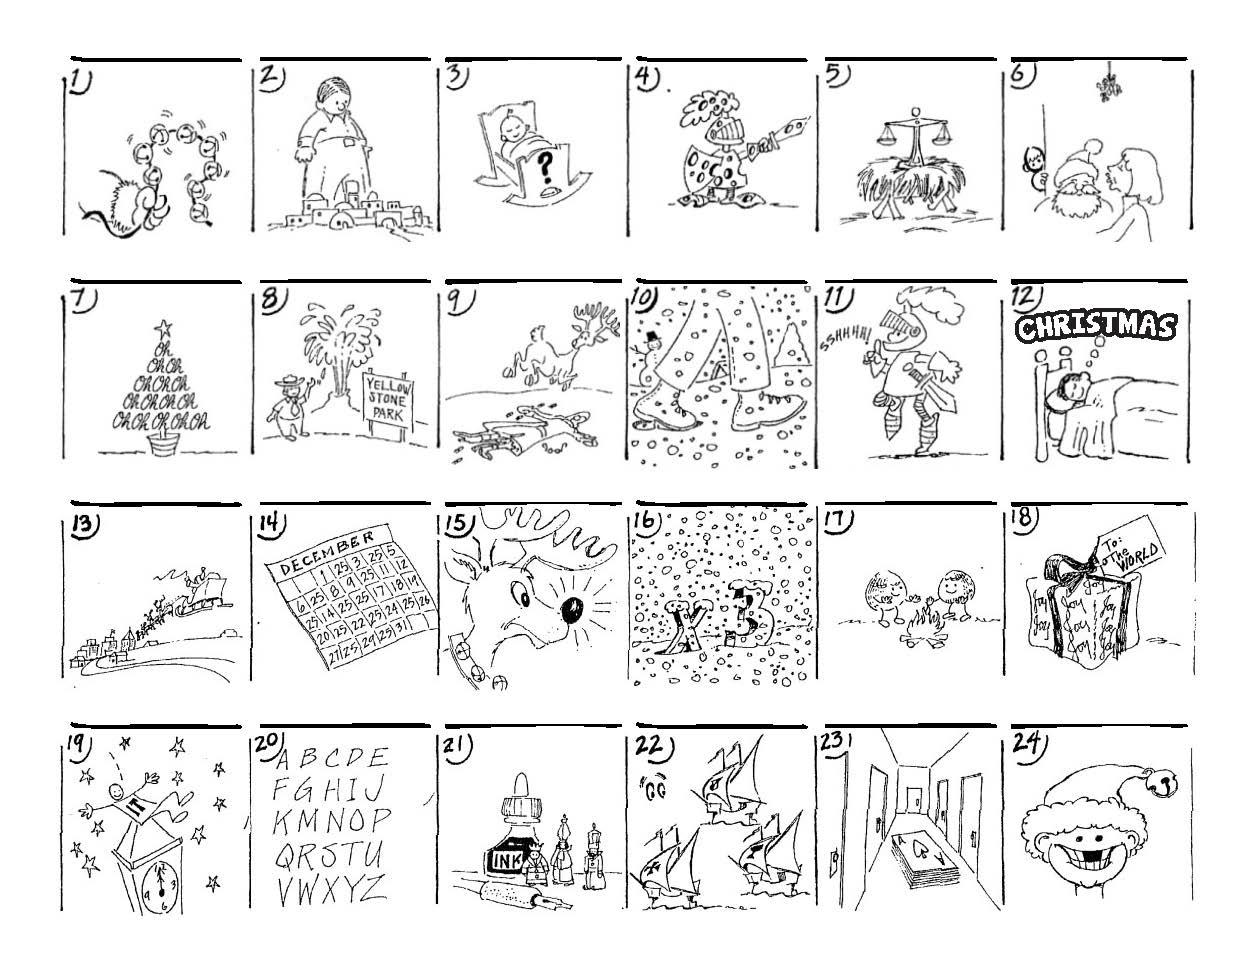 Christmas Carol Puzzles – The Button-Down Mind - Printable Christmas Rebus Puzzles